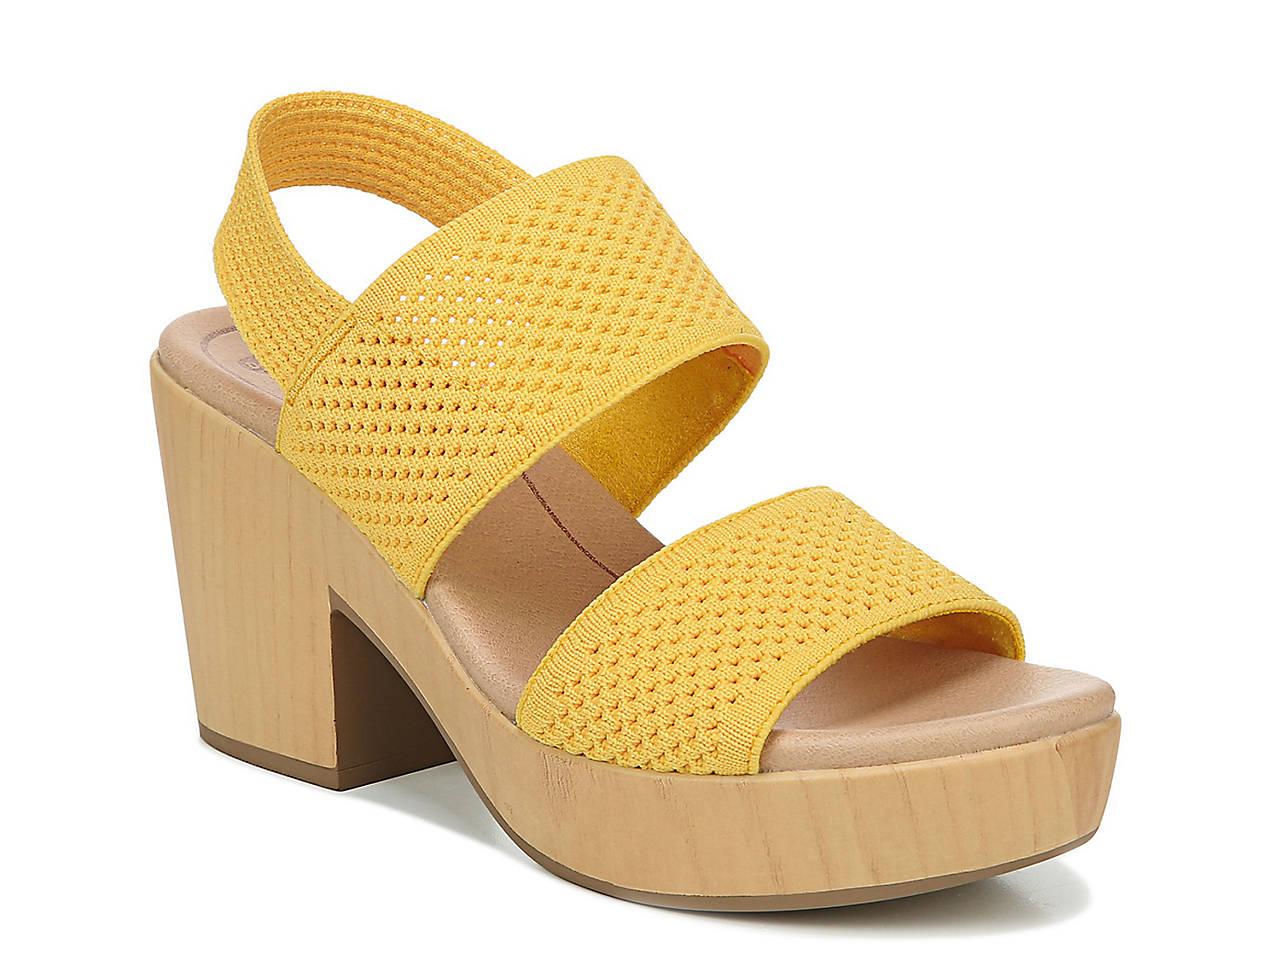 1b9c5dd3835 Dr. Scholl s Becca Platform Sandal Women s Shoes